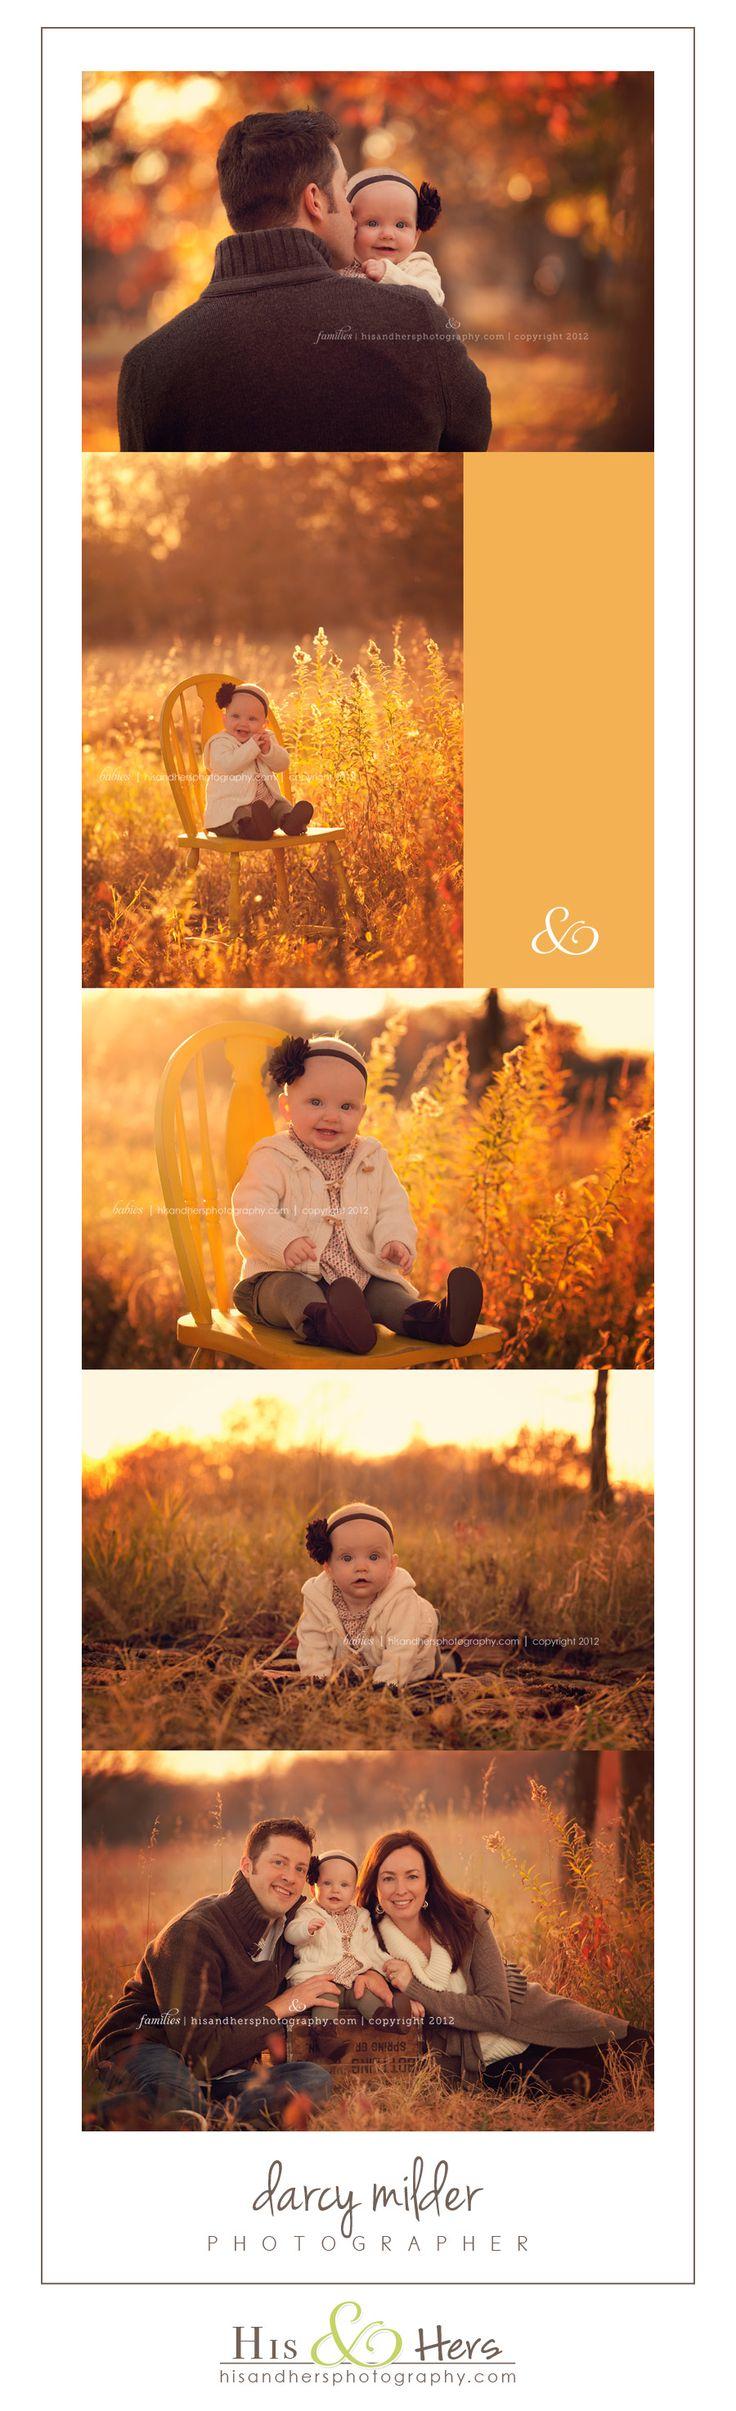 iowa baby child family photographer des moines iowa photography studio